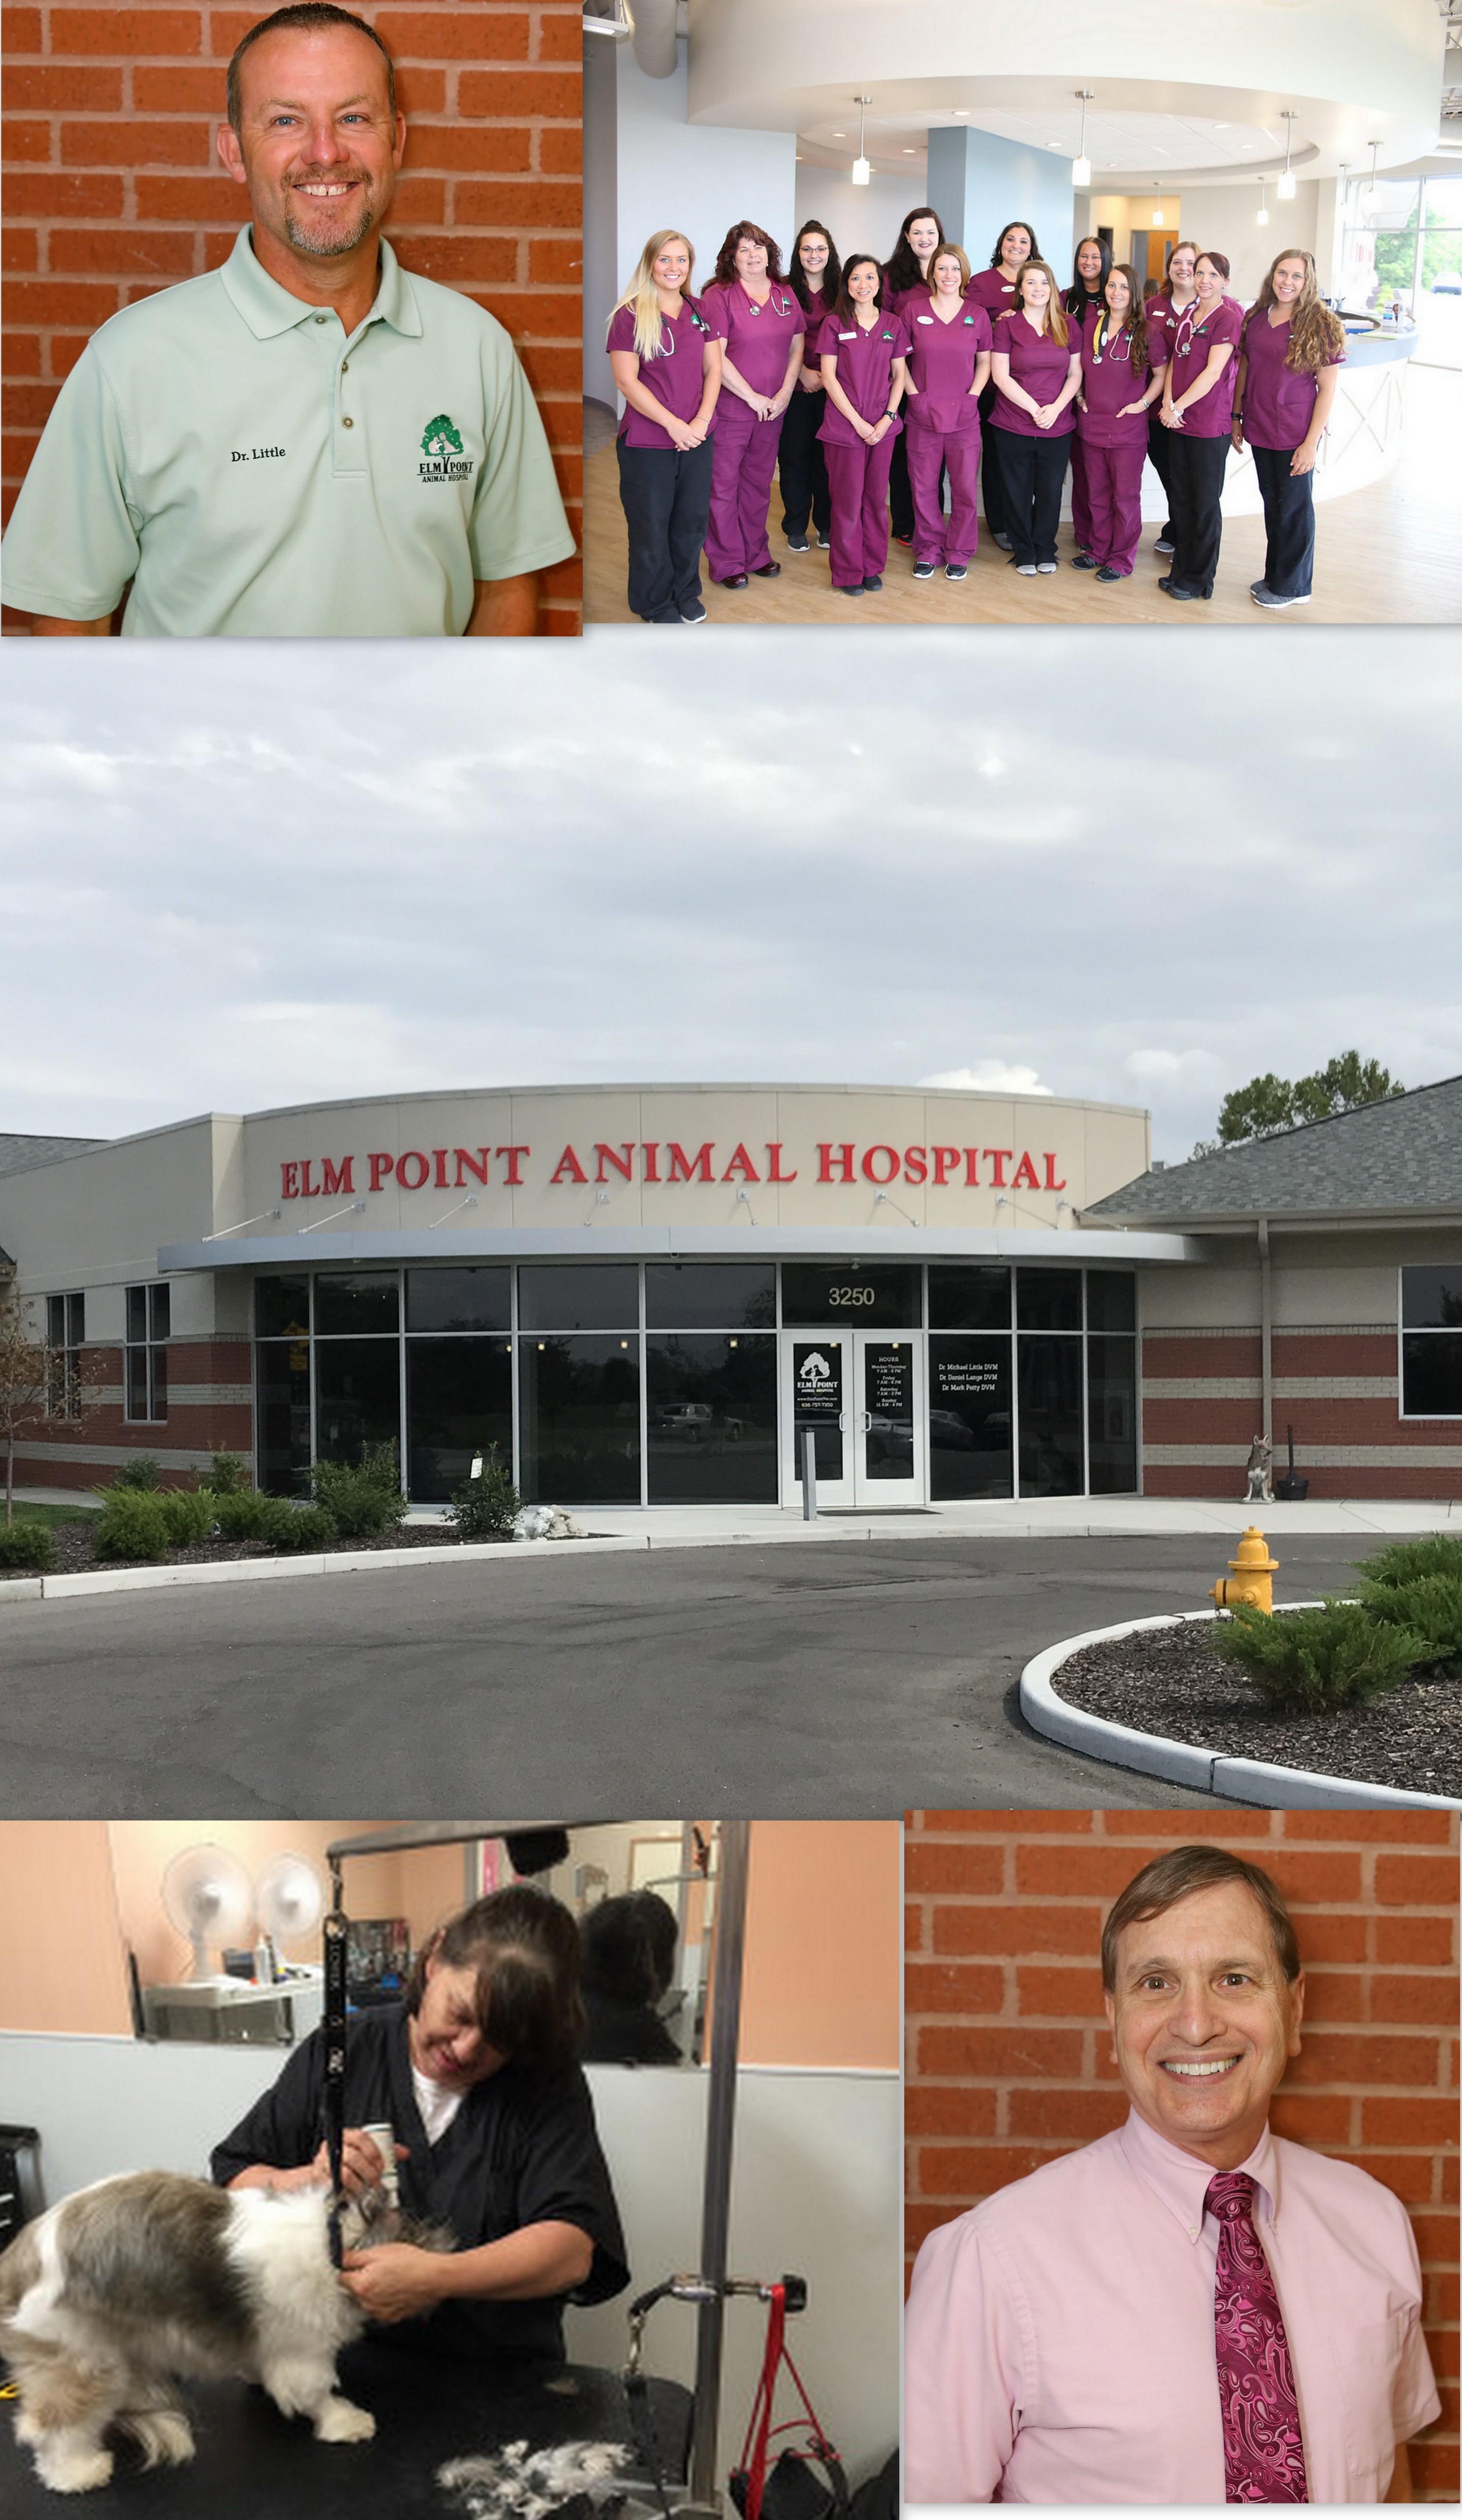 Elm Point Animal Hospital Team